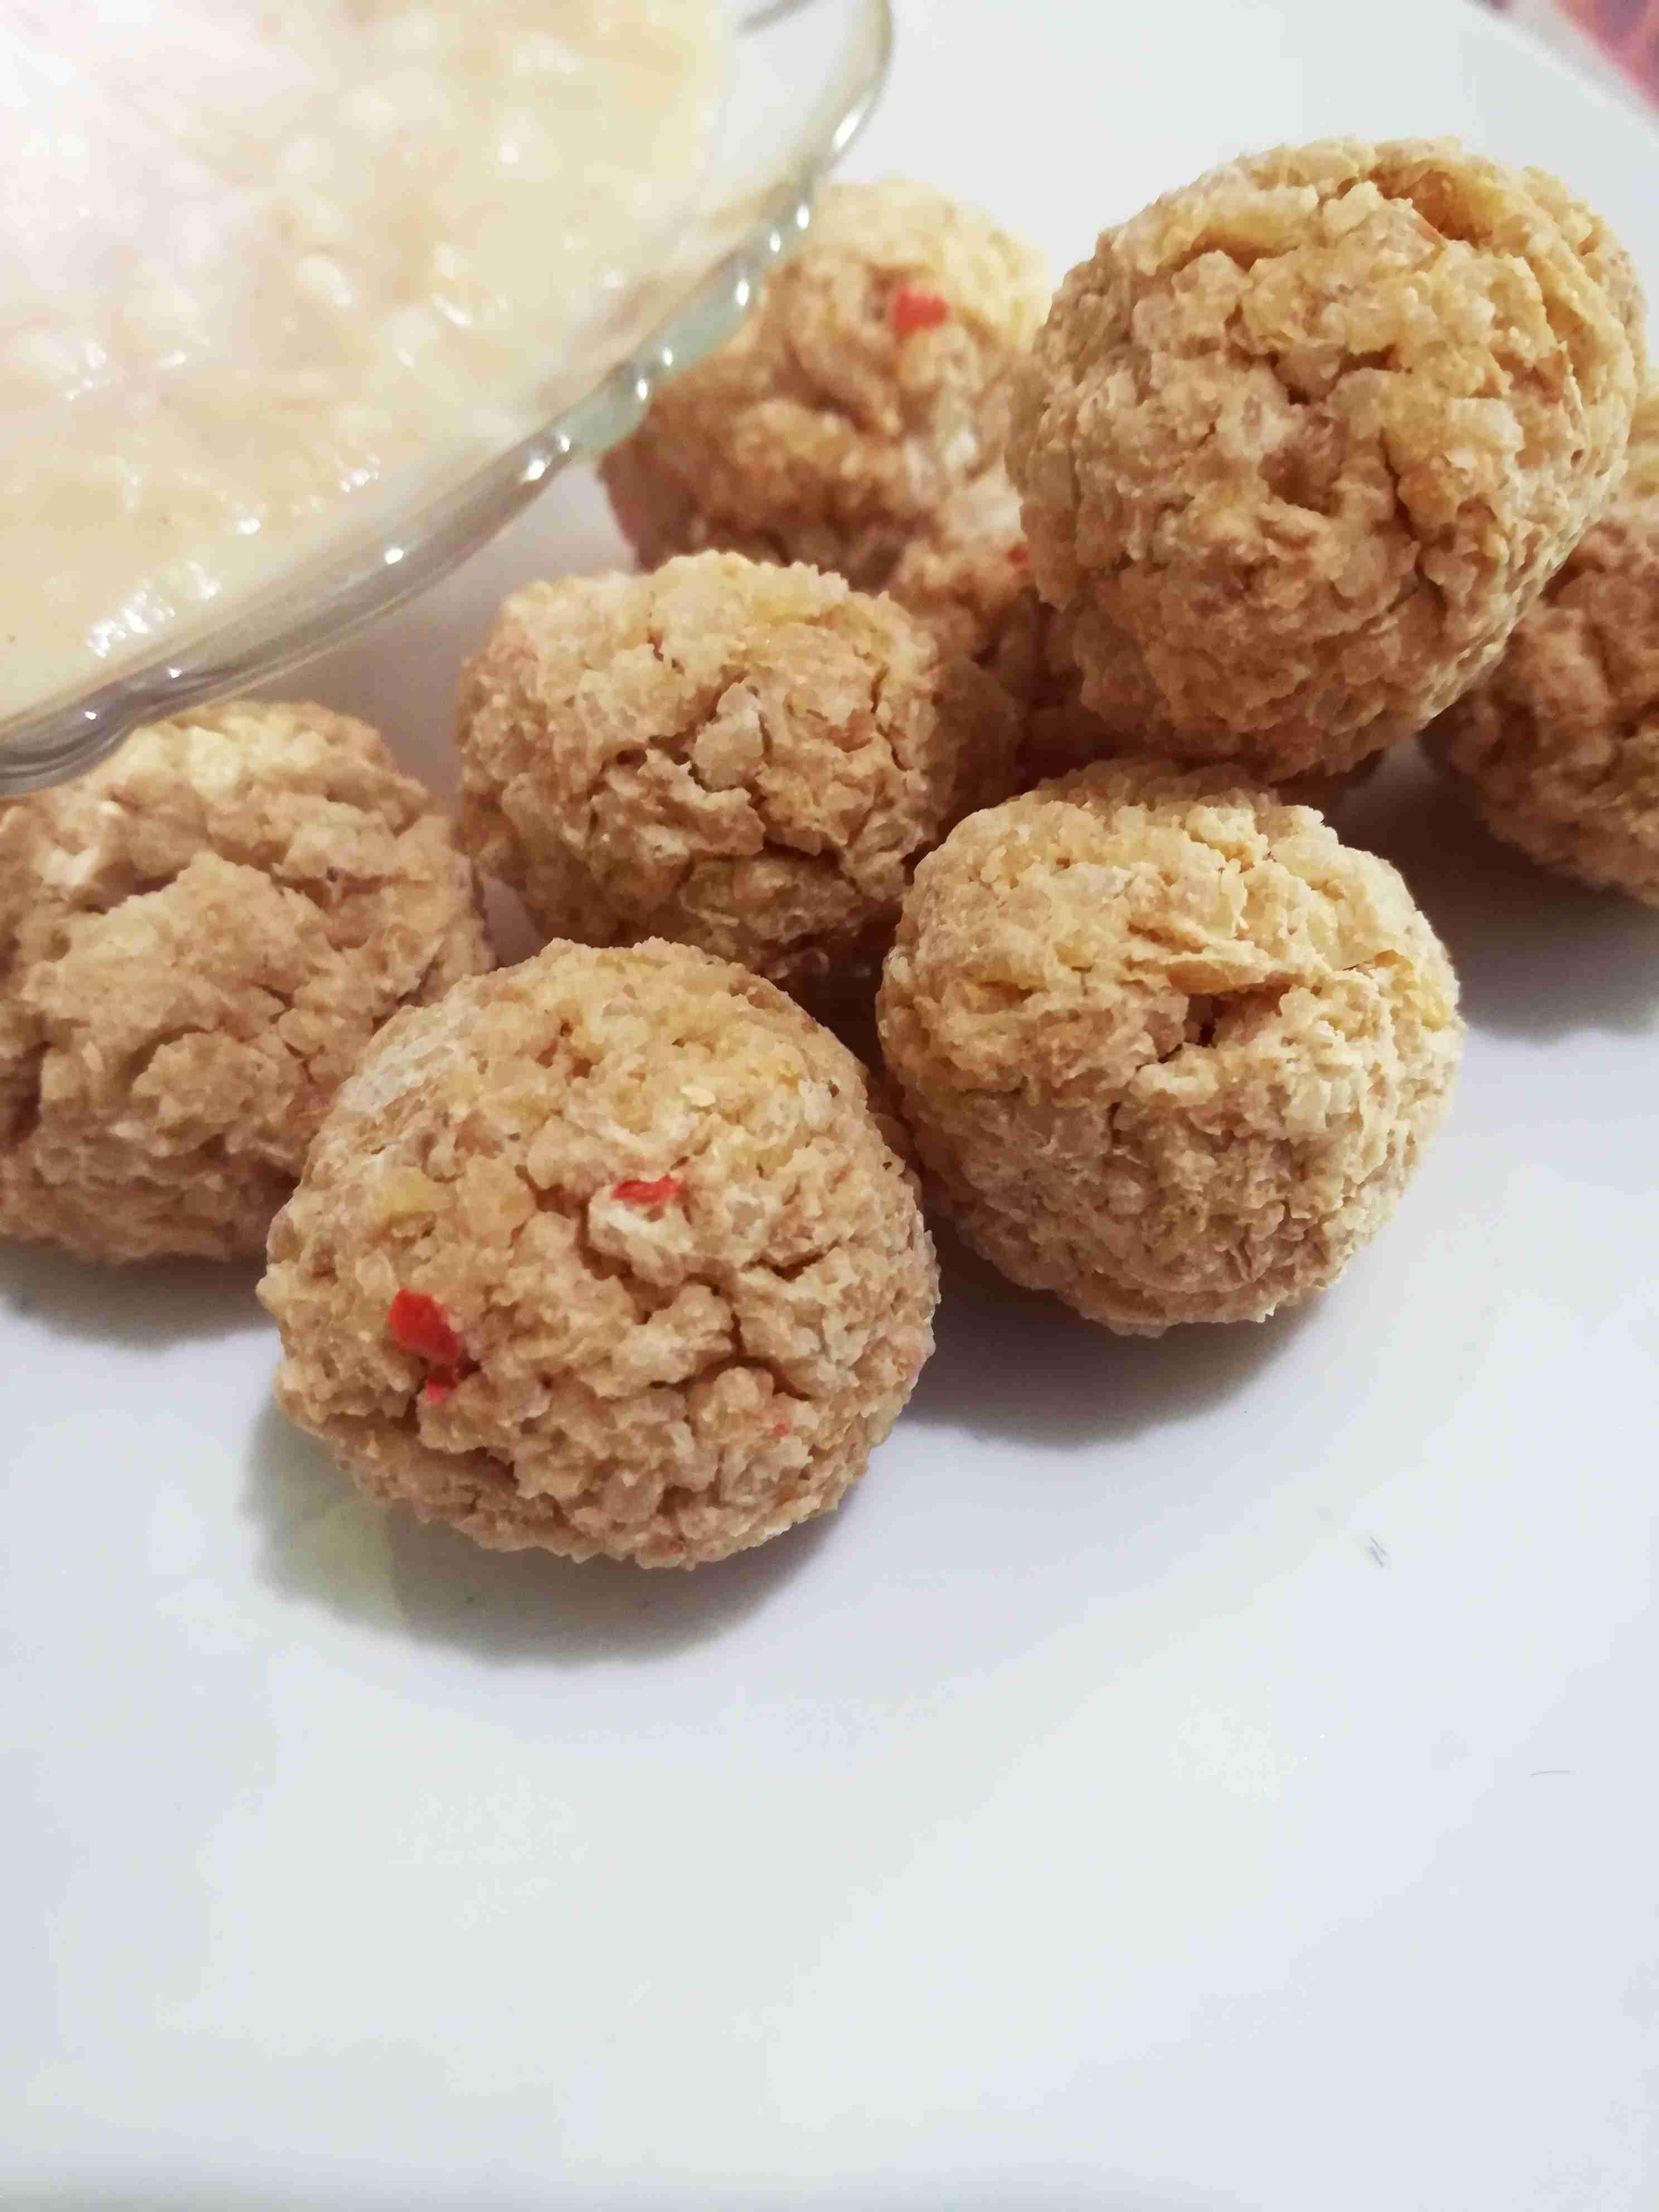 الكشك الصعيدي زاكي Krispie Treats Main Dishes Rice Krispie Treat